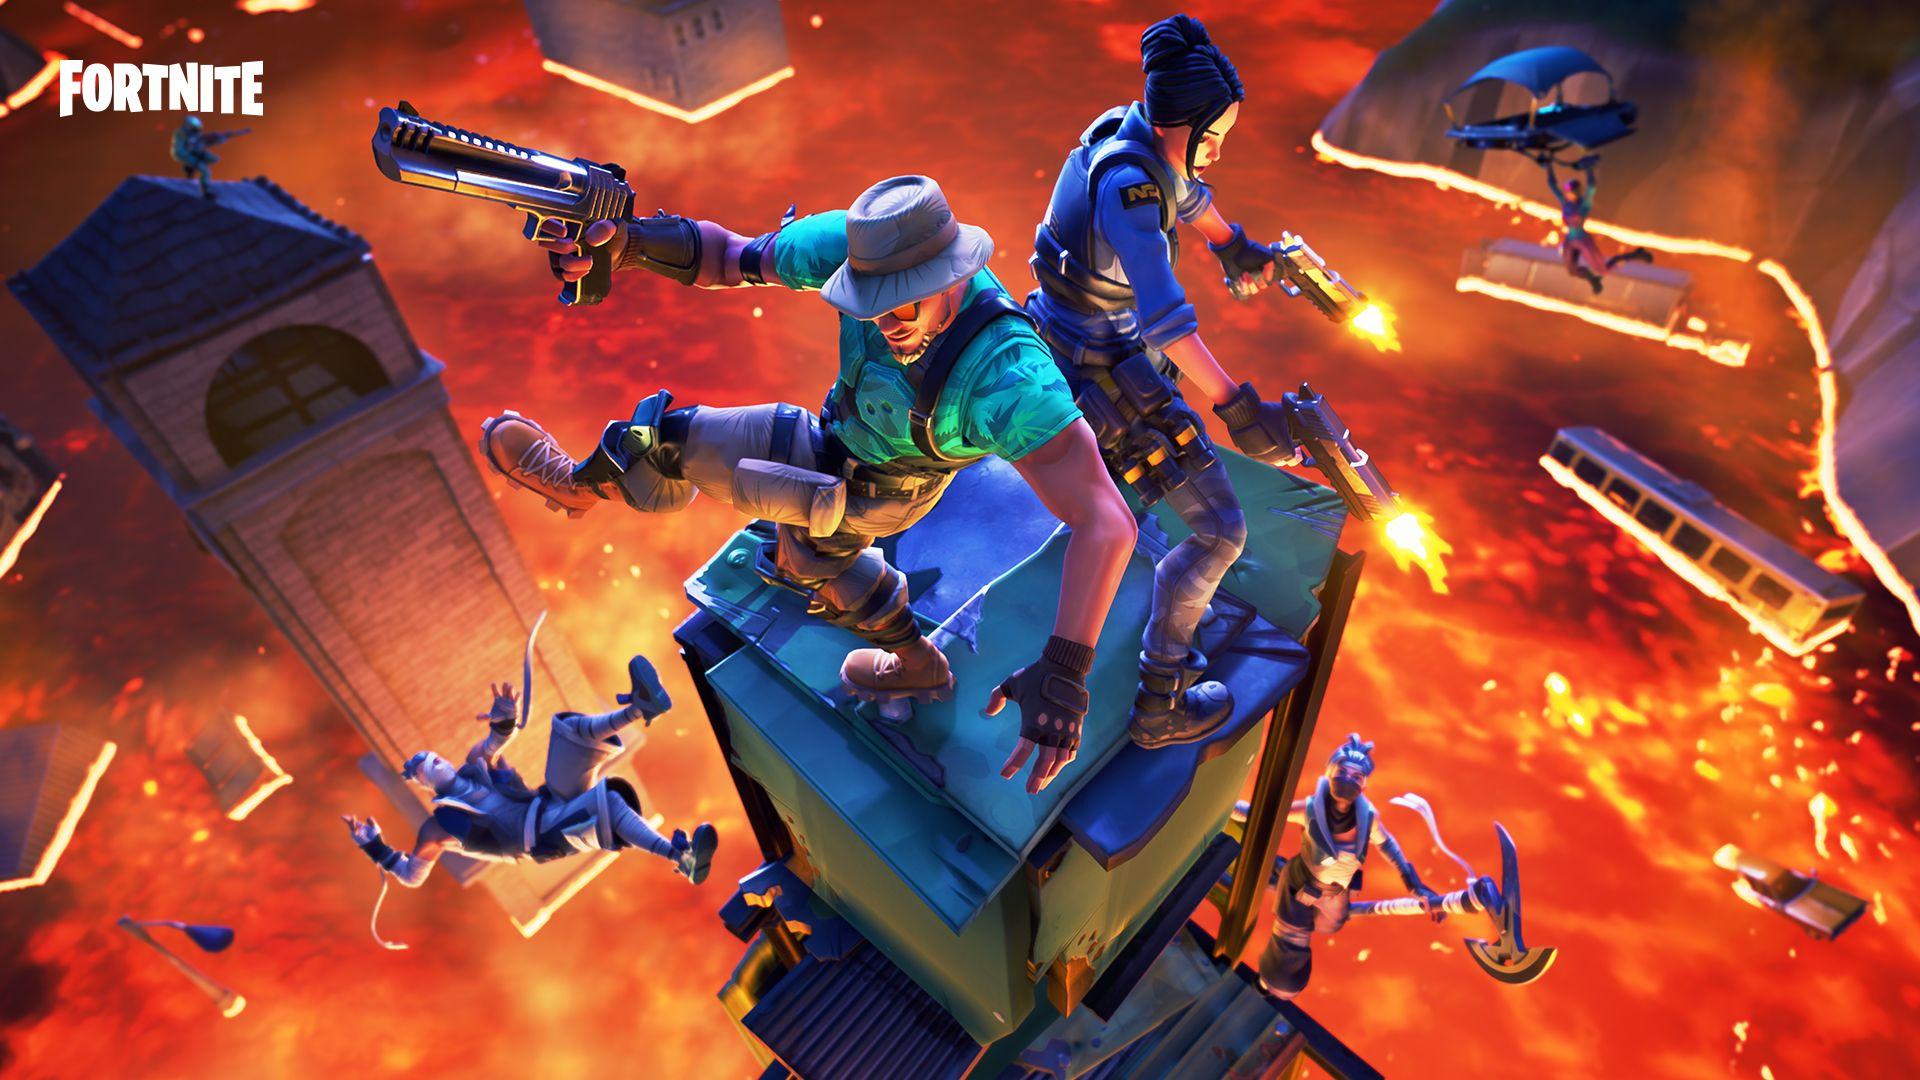 fortnite floor is lava - the matrix gaming fortnite